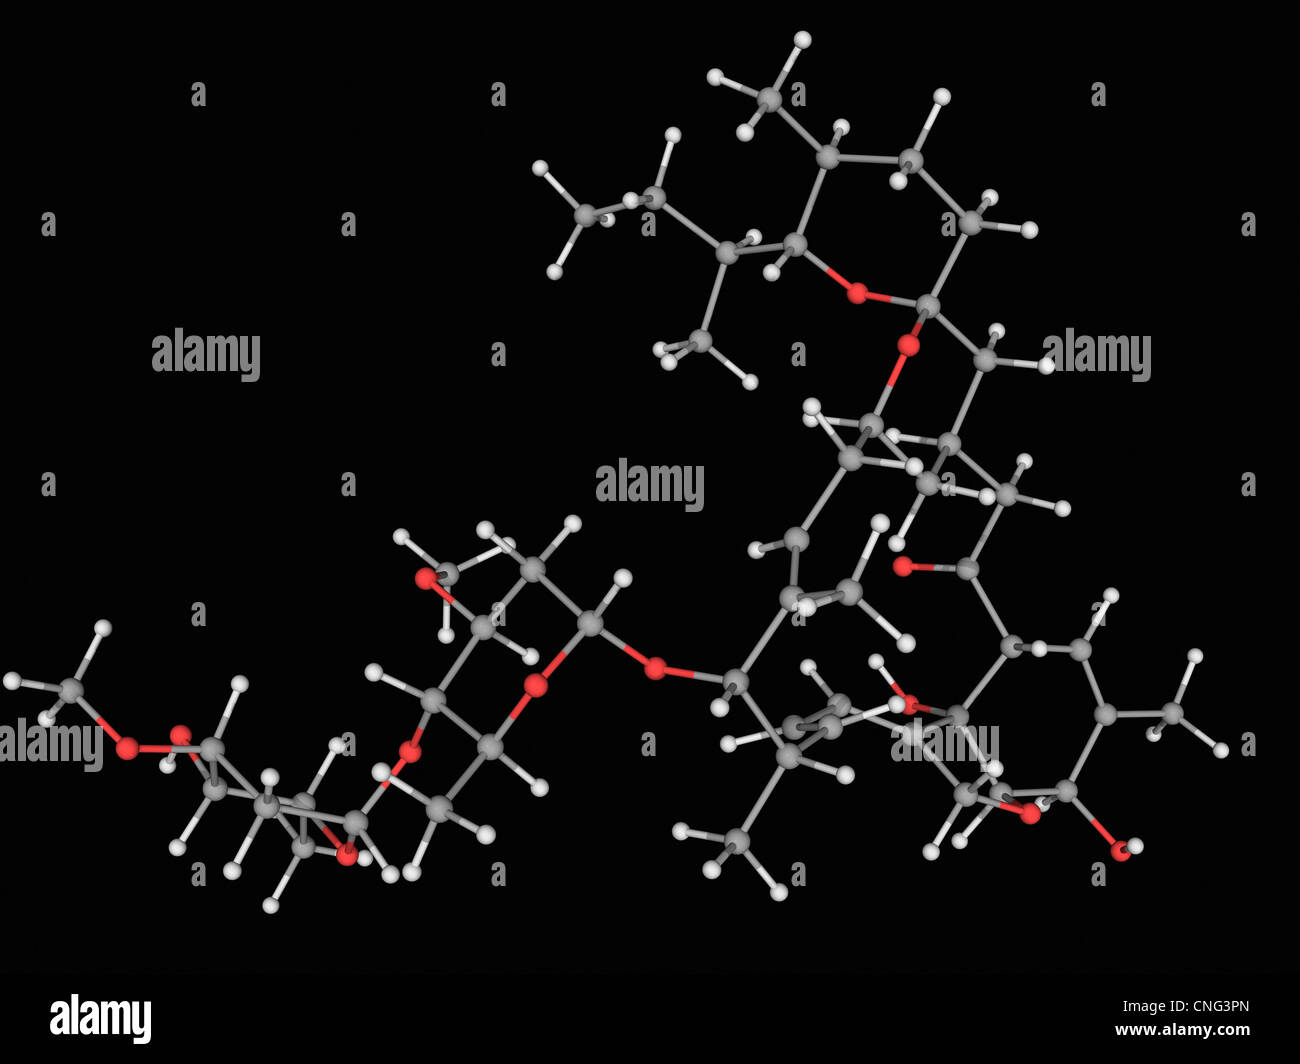 Ivermectin drug molecule - Stock Image